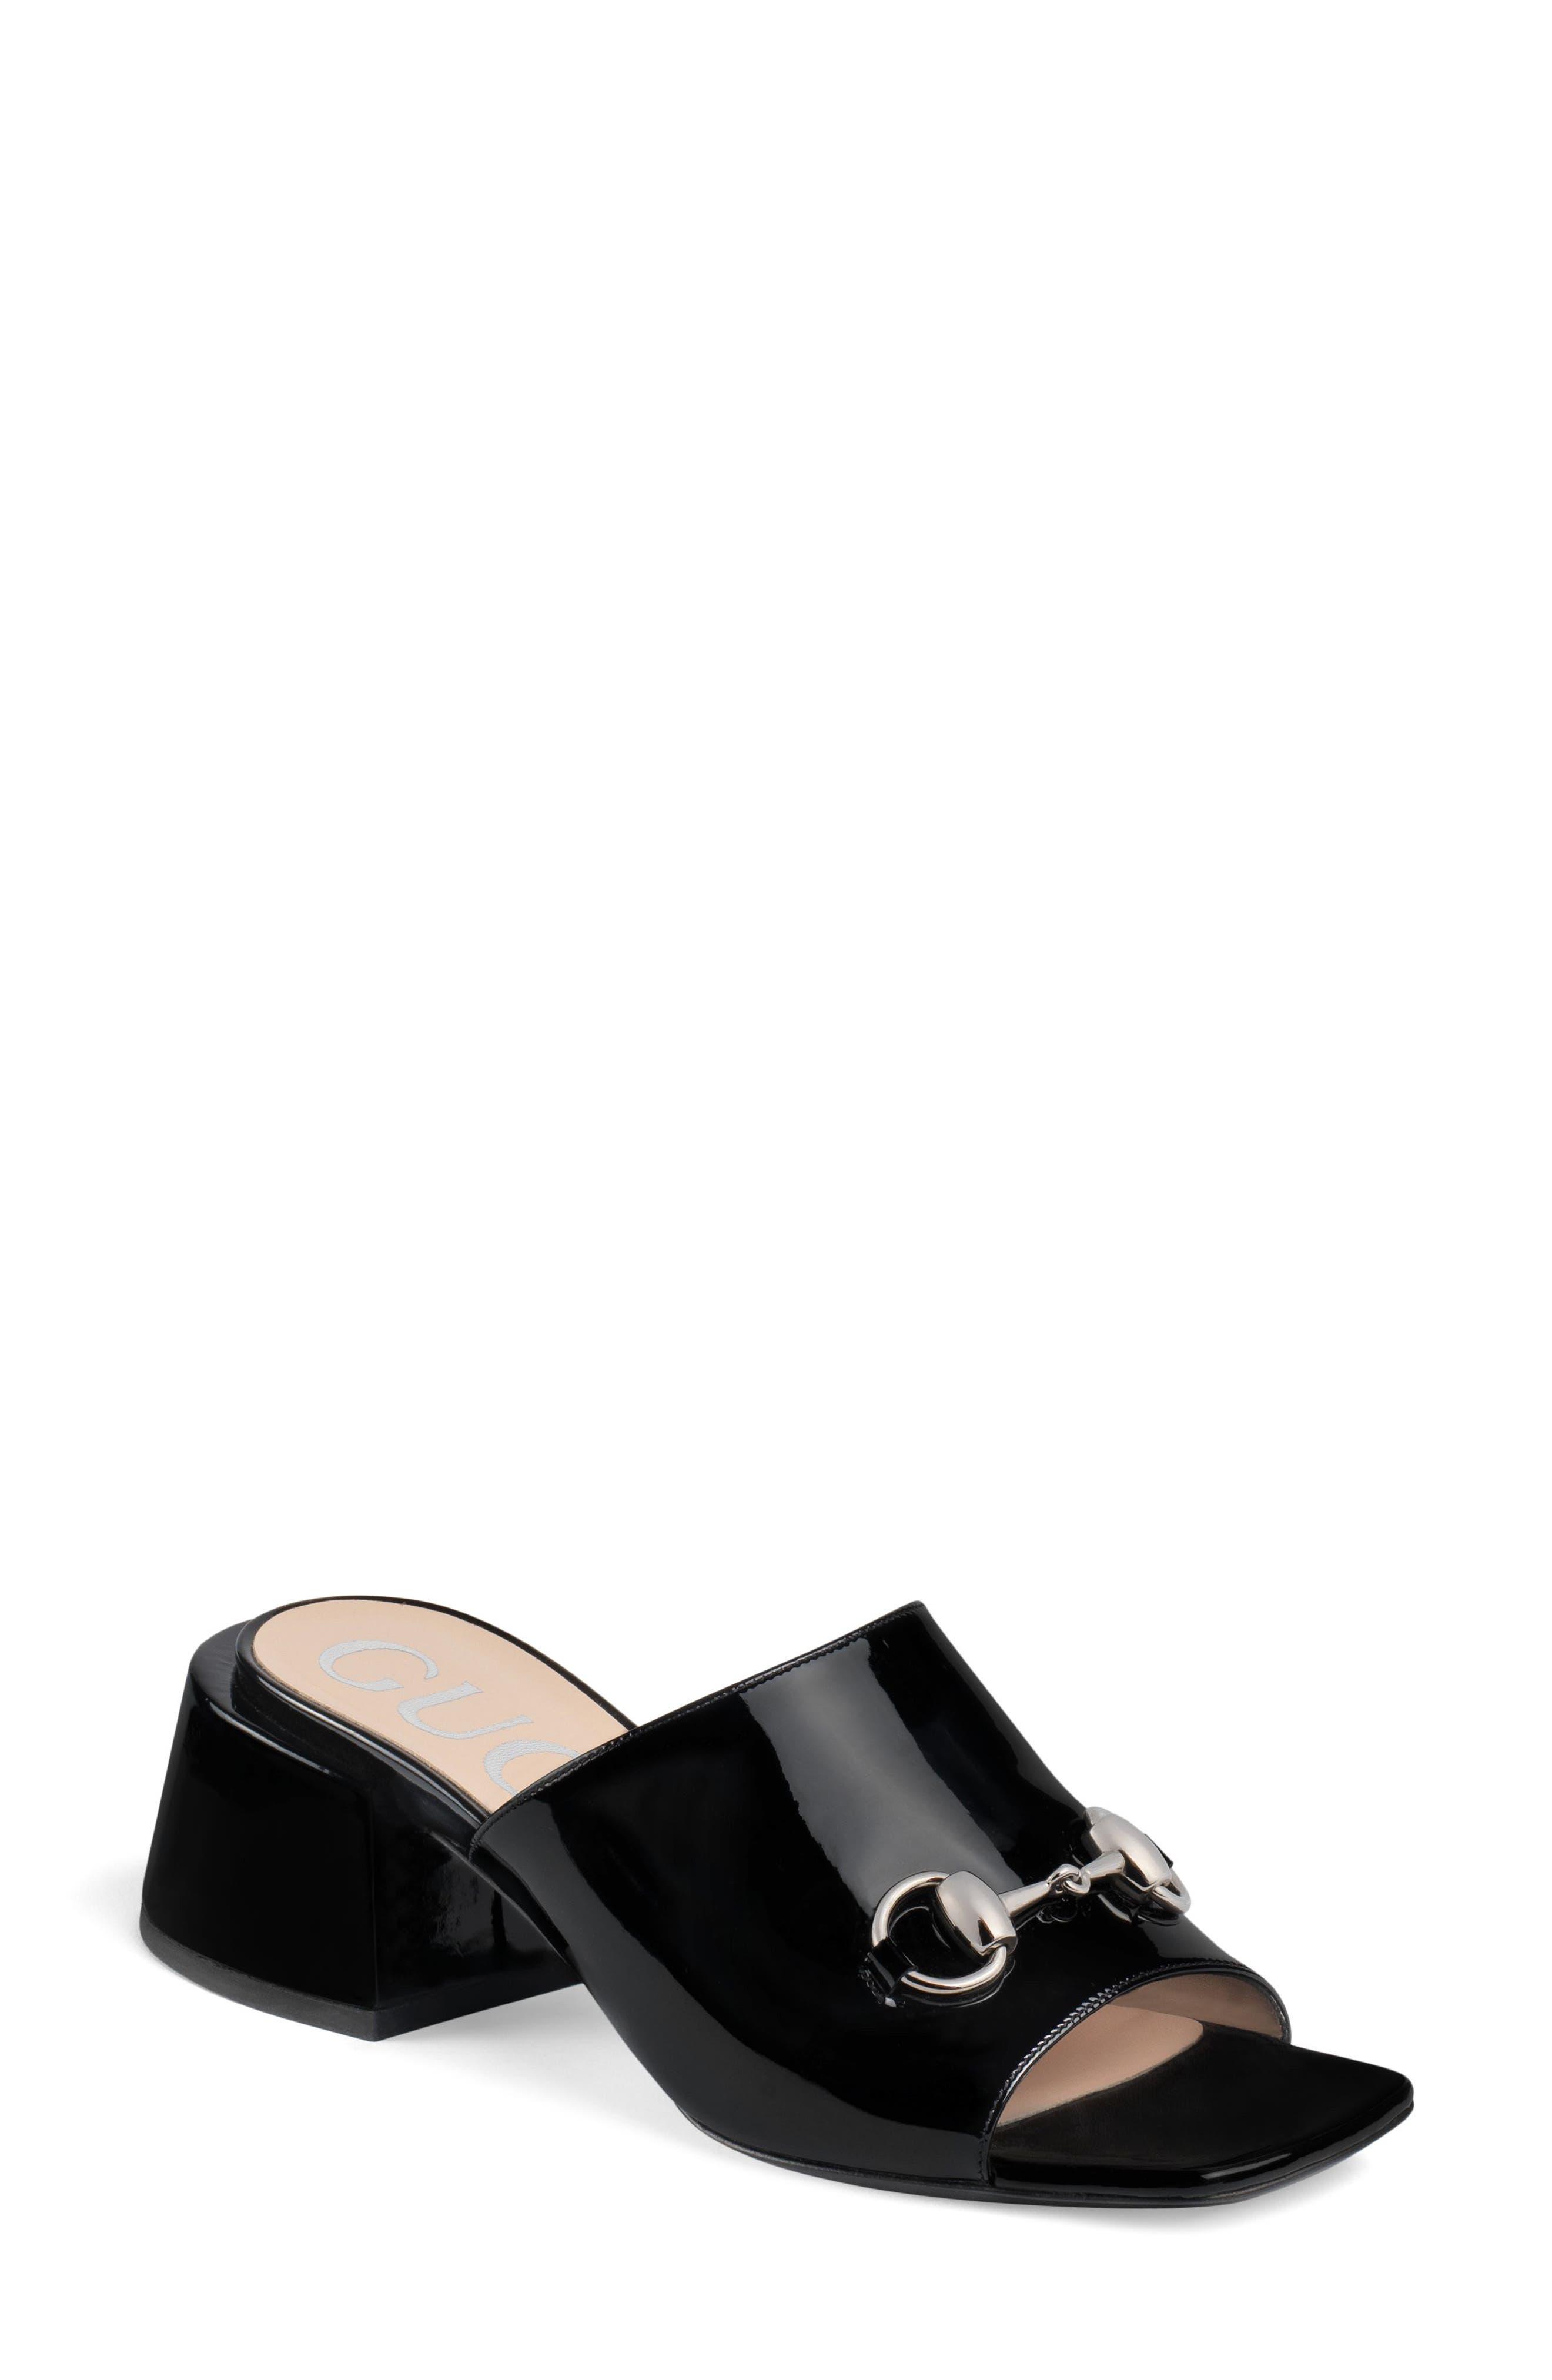 GUCCI, Lexi Slide Sandal, Main thumbnail 1, color, BLACK